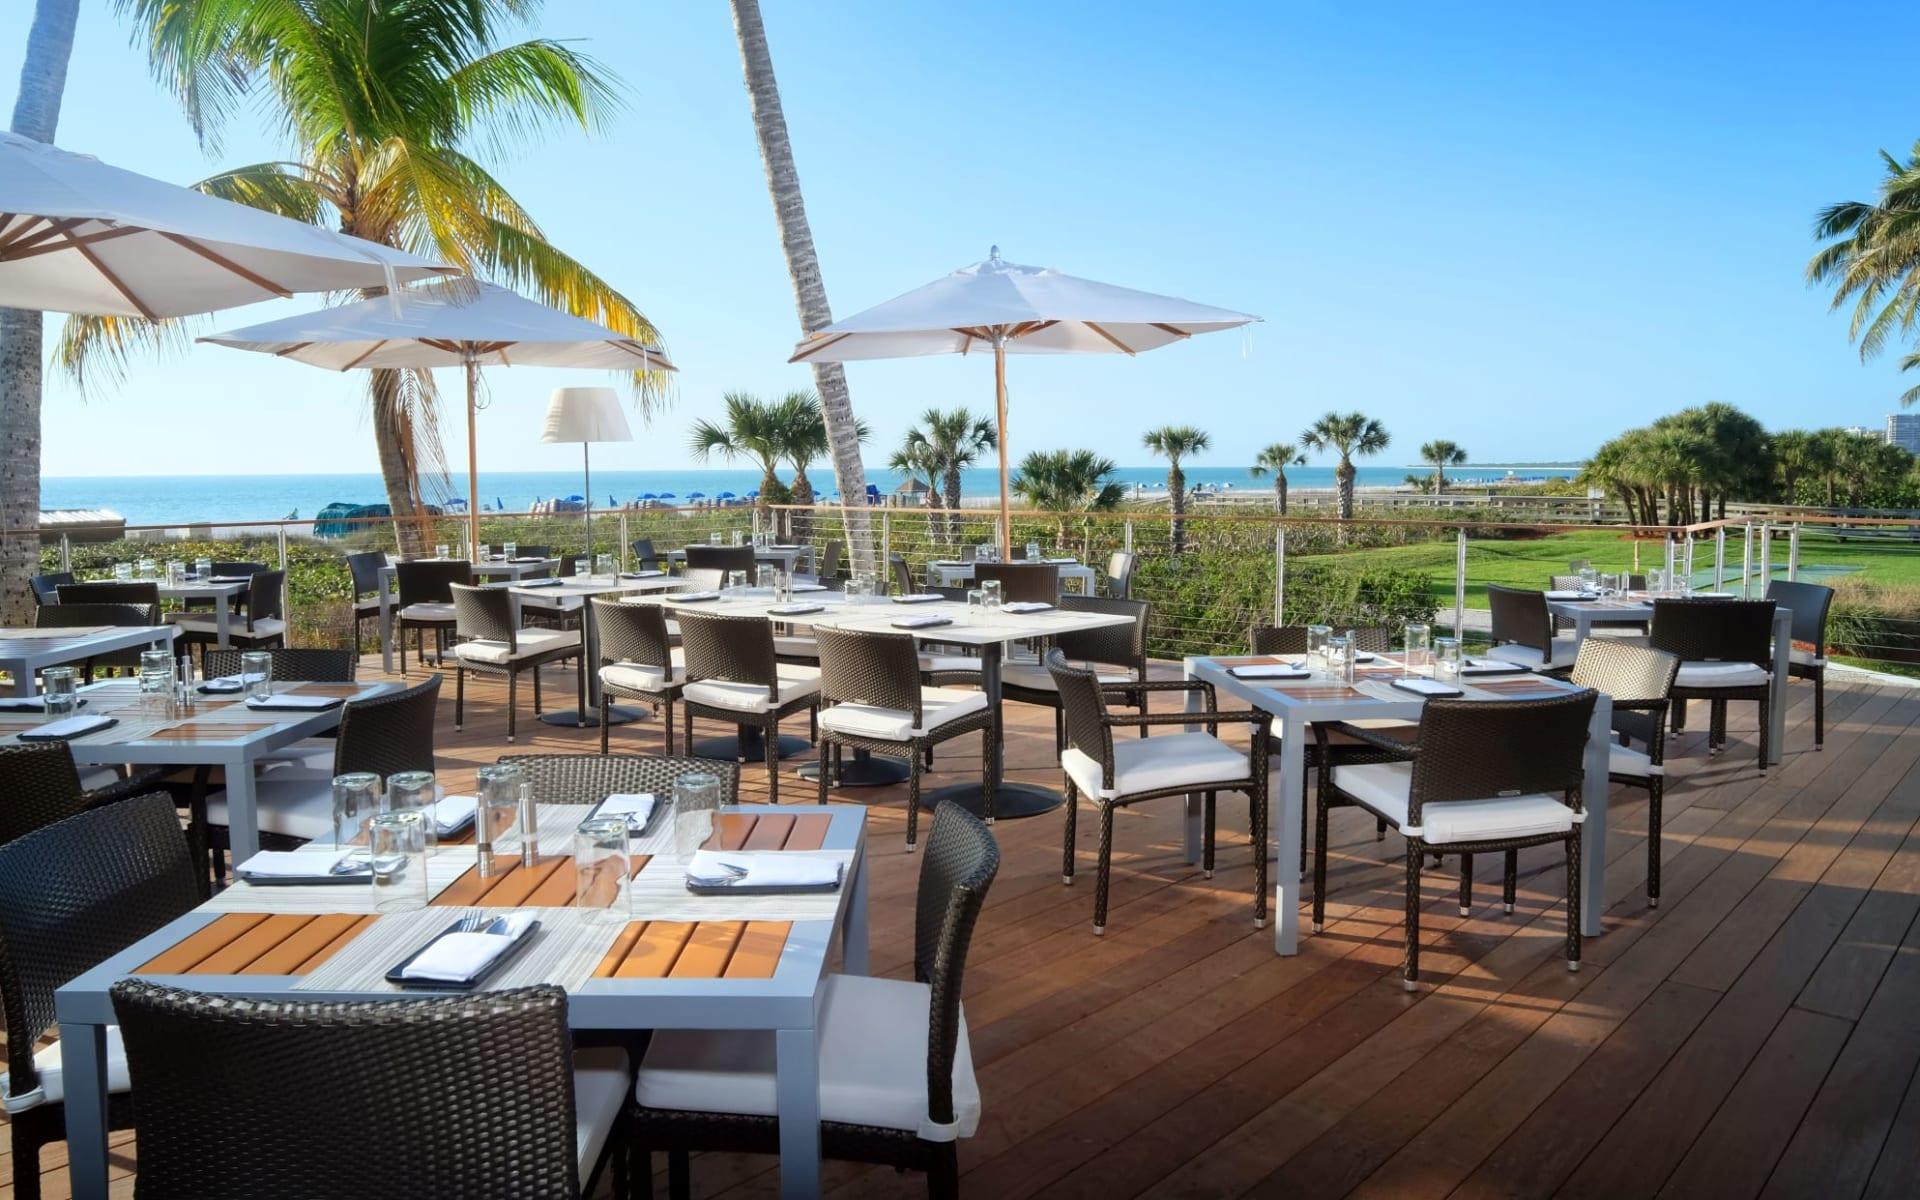 Hilton Marco Island Resort:  Hilton Marco Island Resort_Restaurant